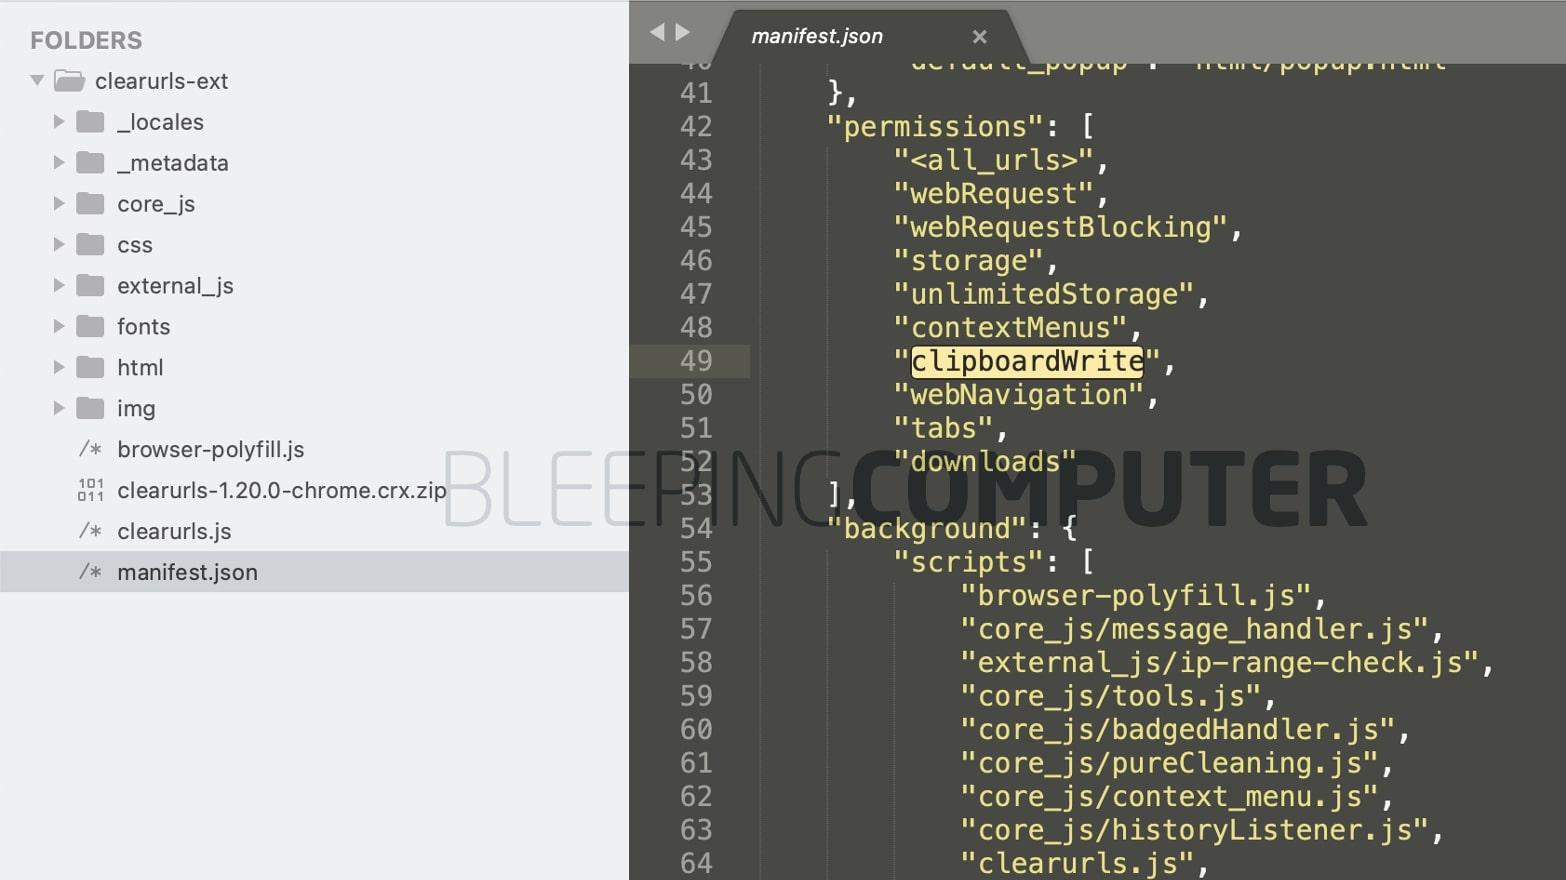 ClearURLs uses clipboardWrite permission